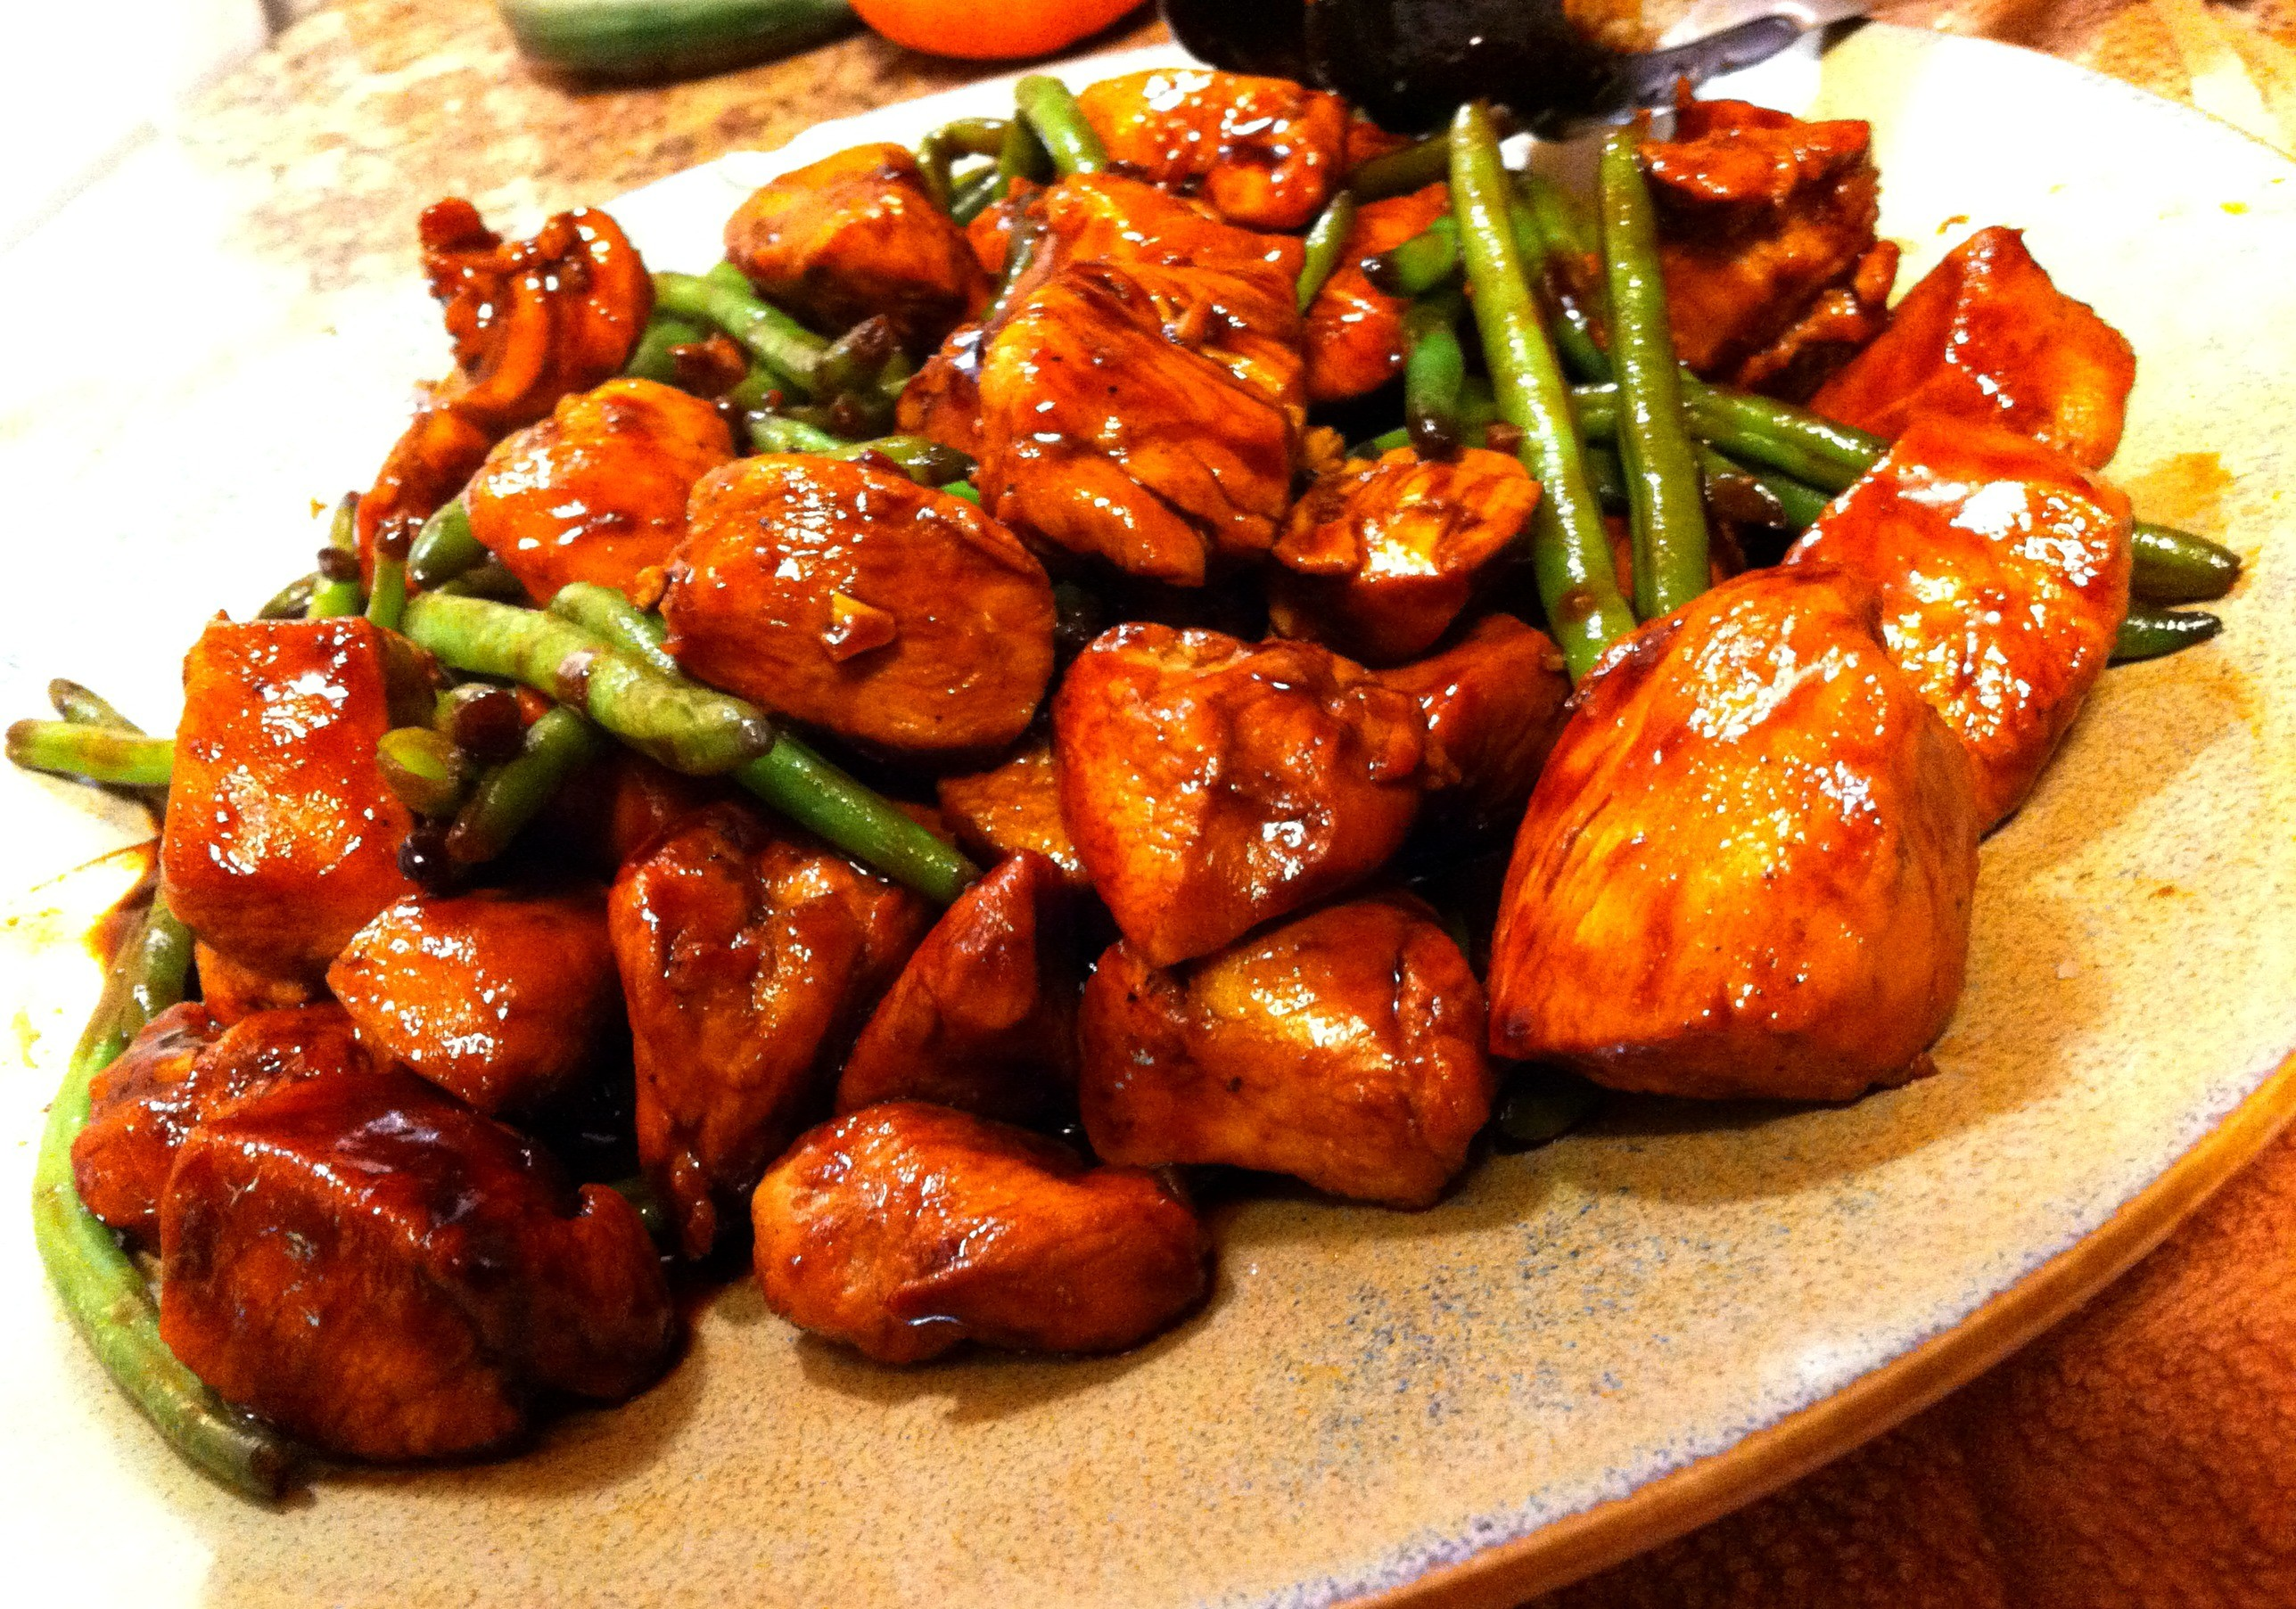 Asian Chicken Food Wallpaper Background 60025